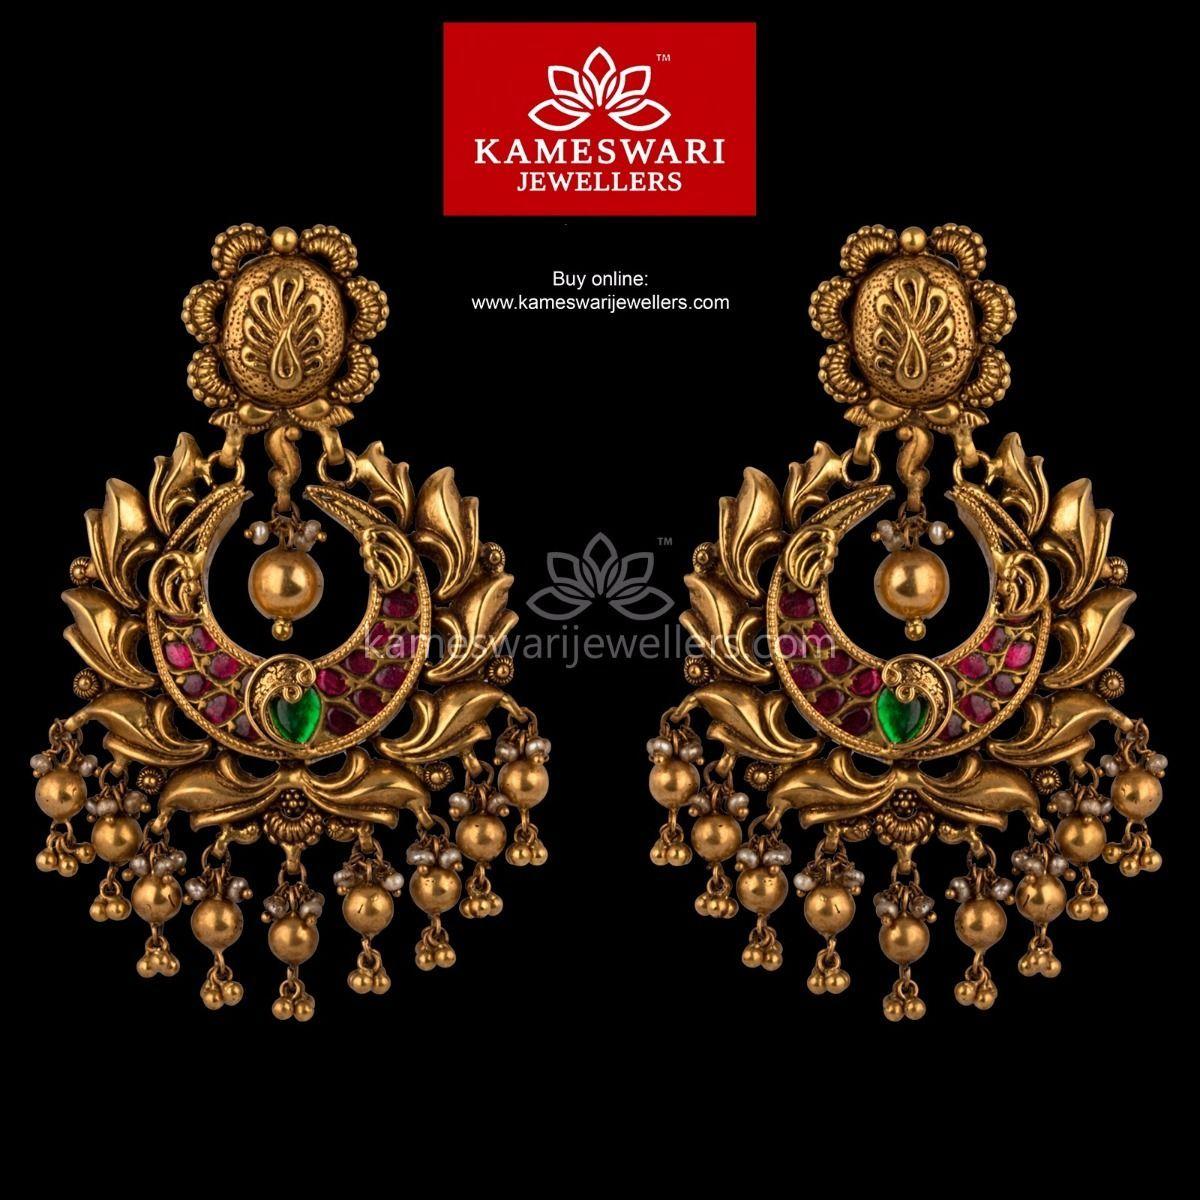 bd4dc7c2cf2 Buy traditional Earrings online at Kameswari Jewellers in India.